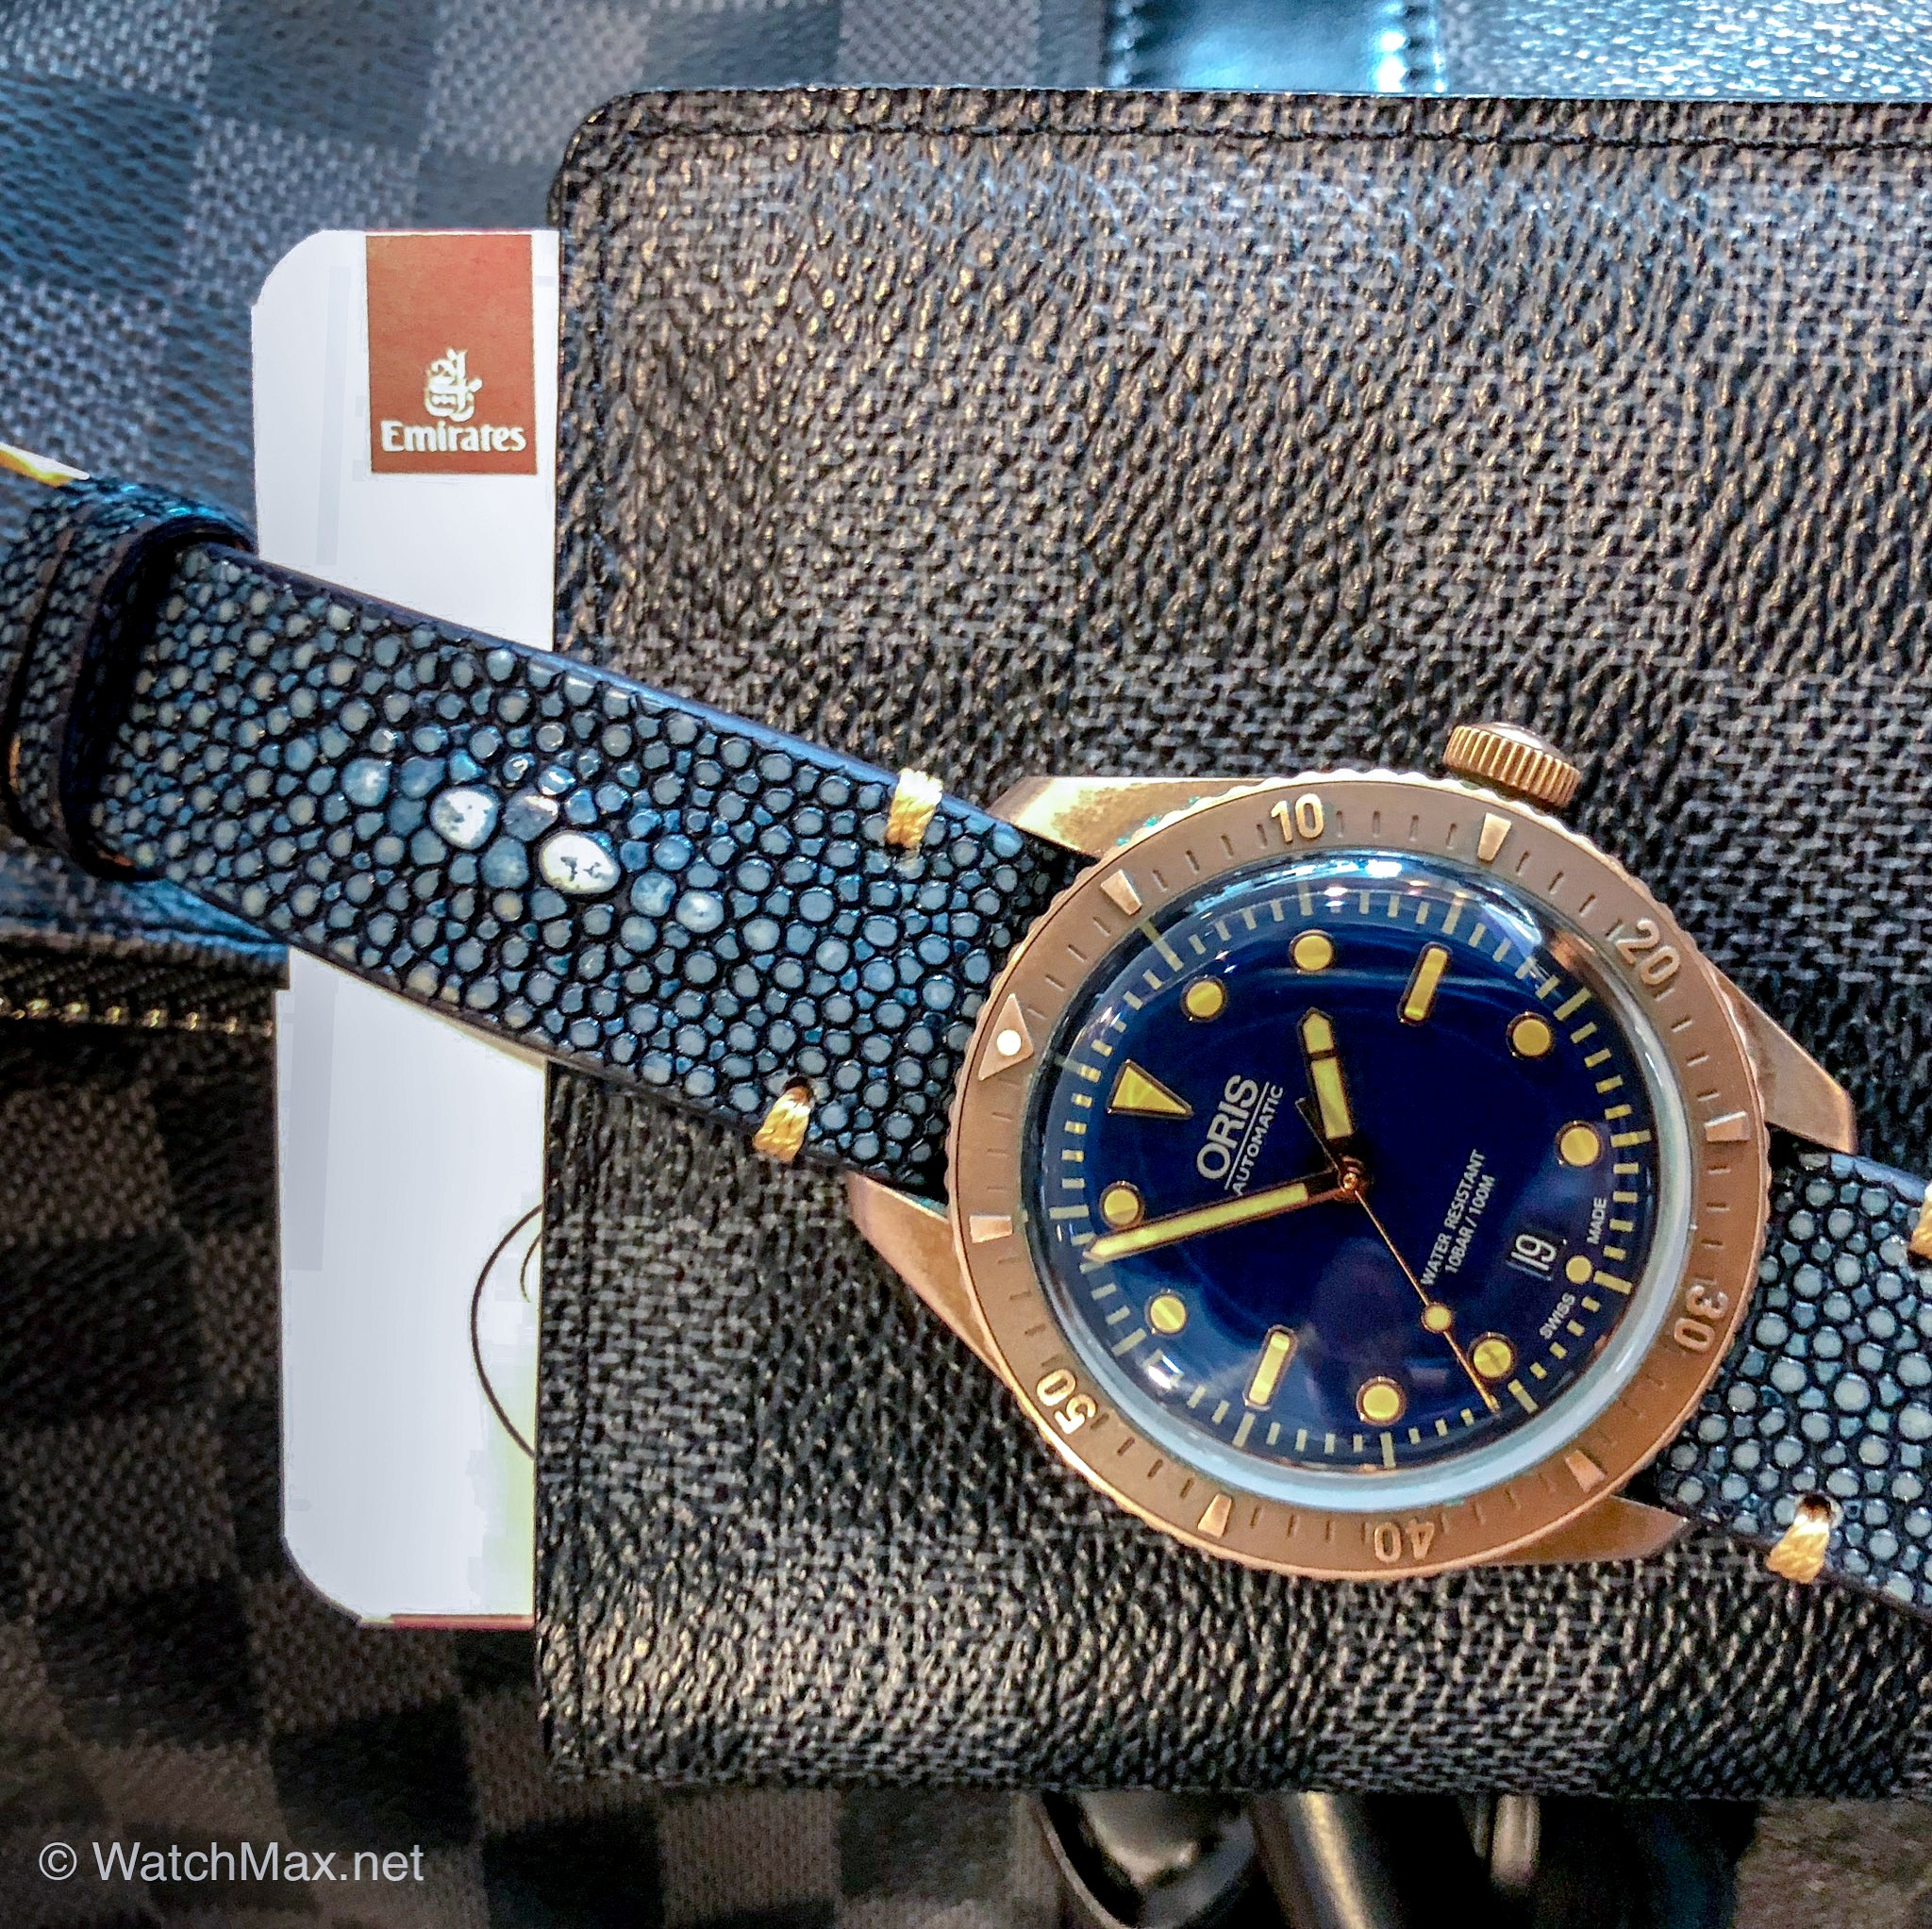 oris-diver-sixtyfive-carl-brashear-limited-edition-63.jpg